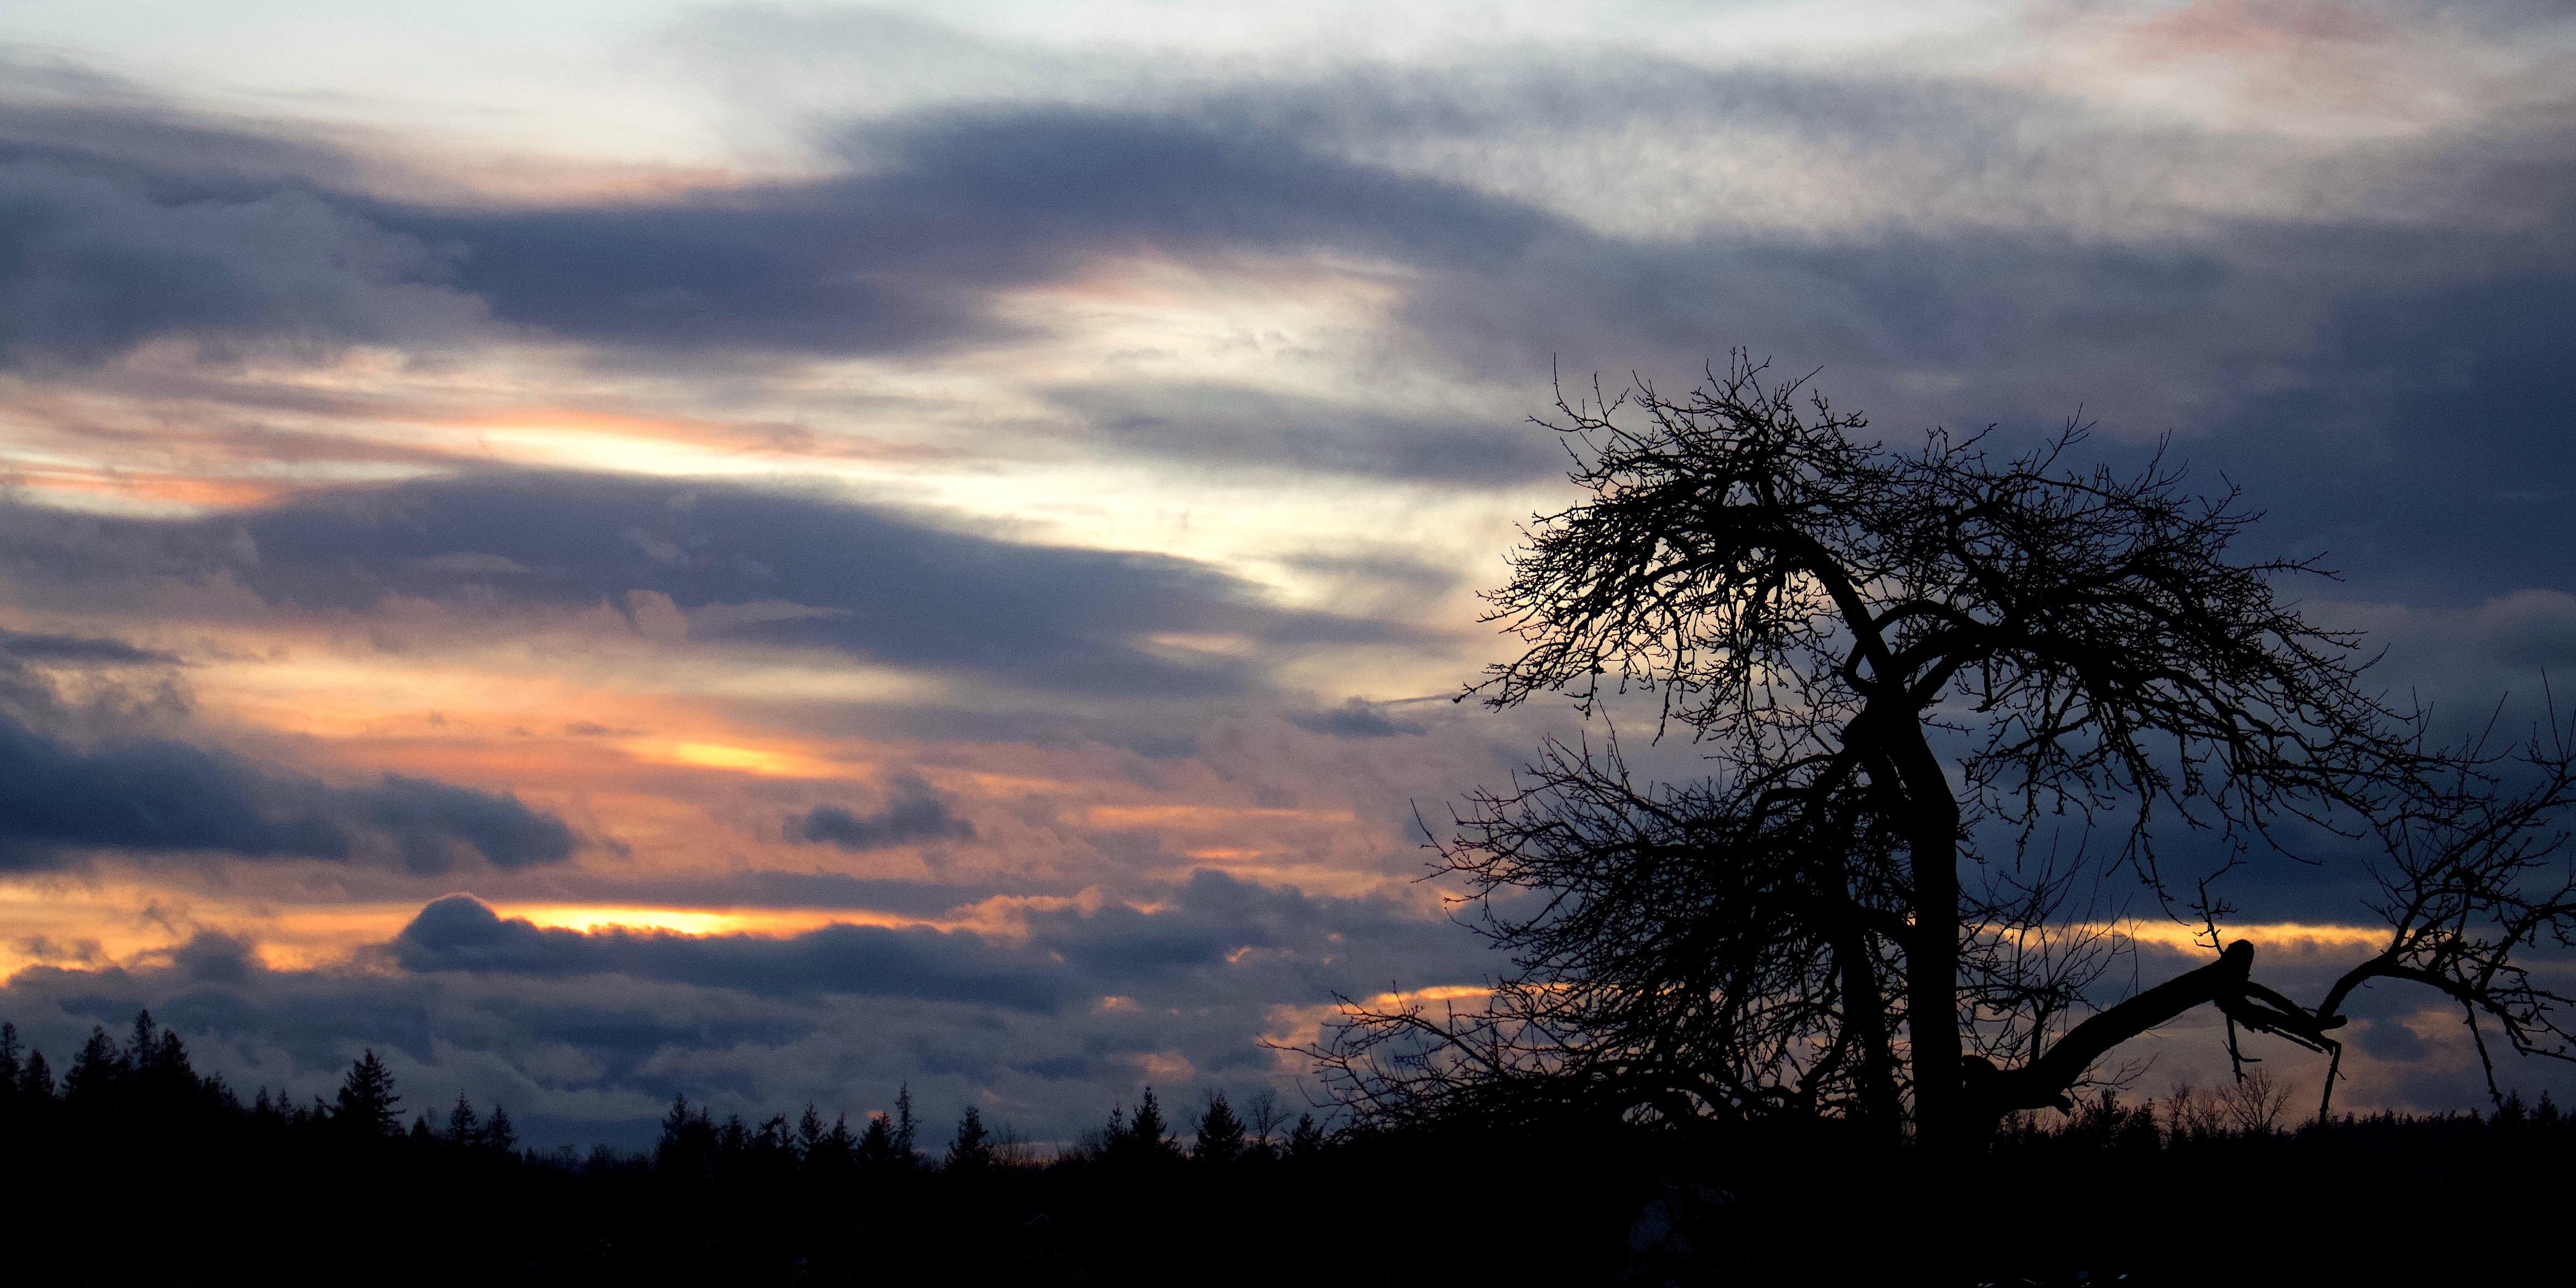 sunset125181